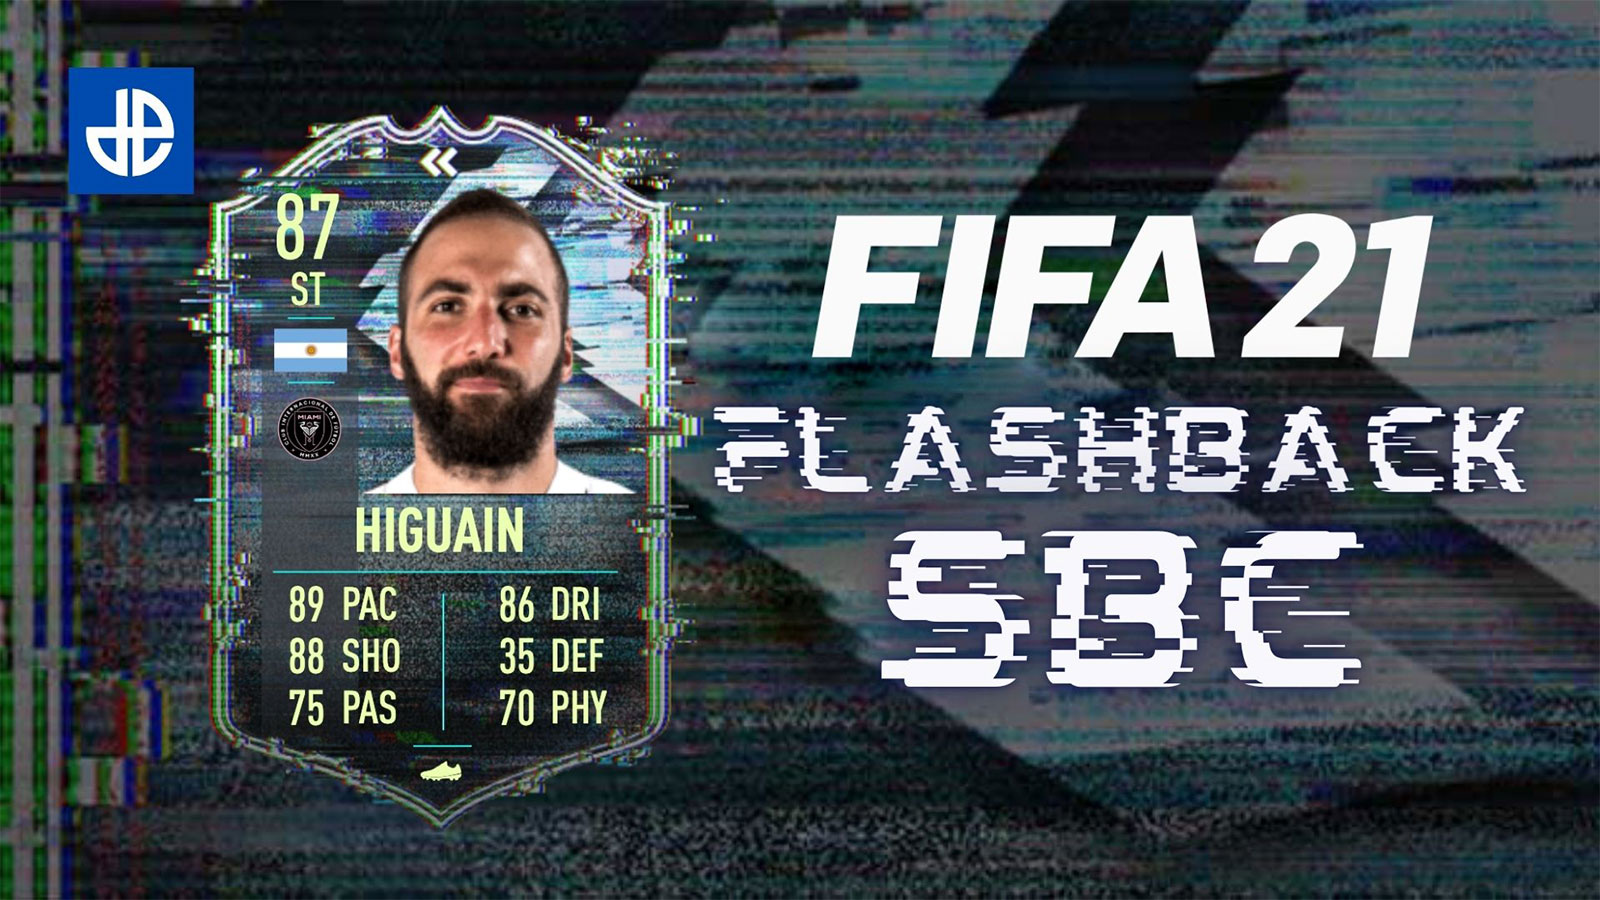 Higuain Flashback SBC